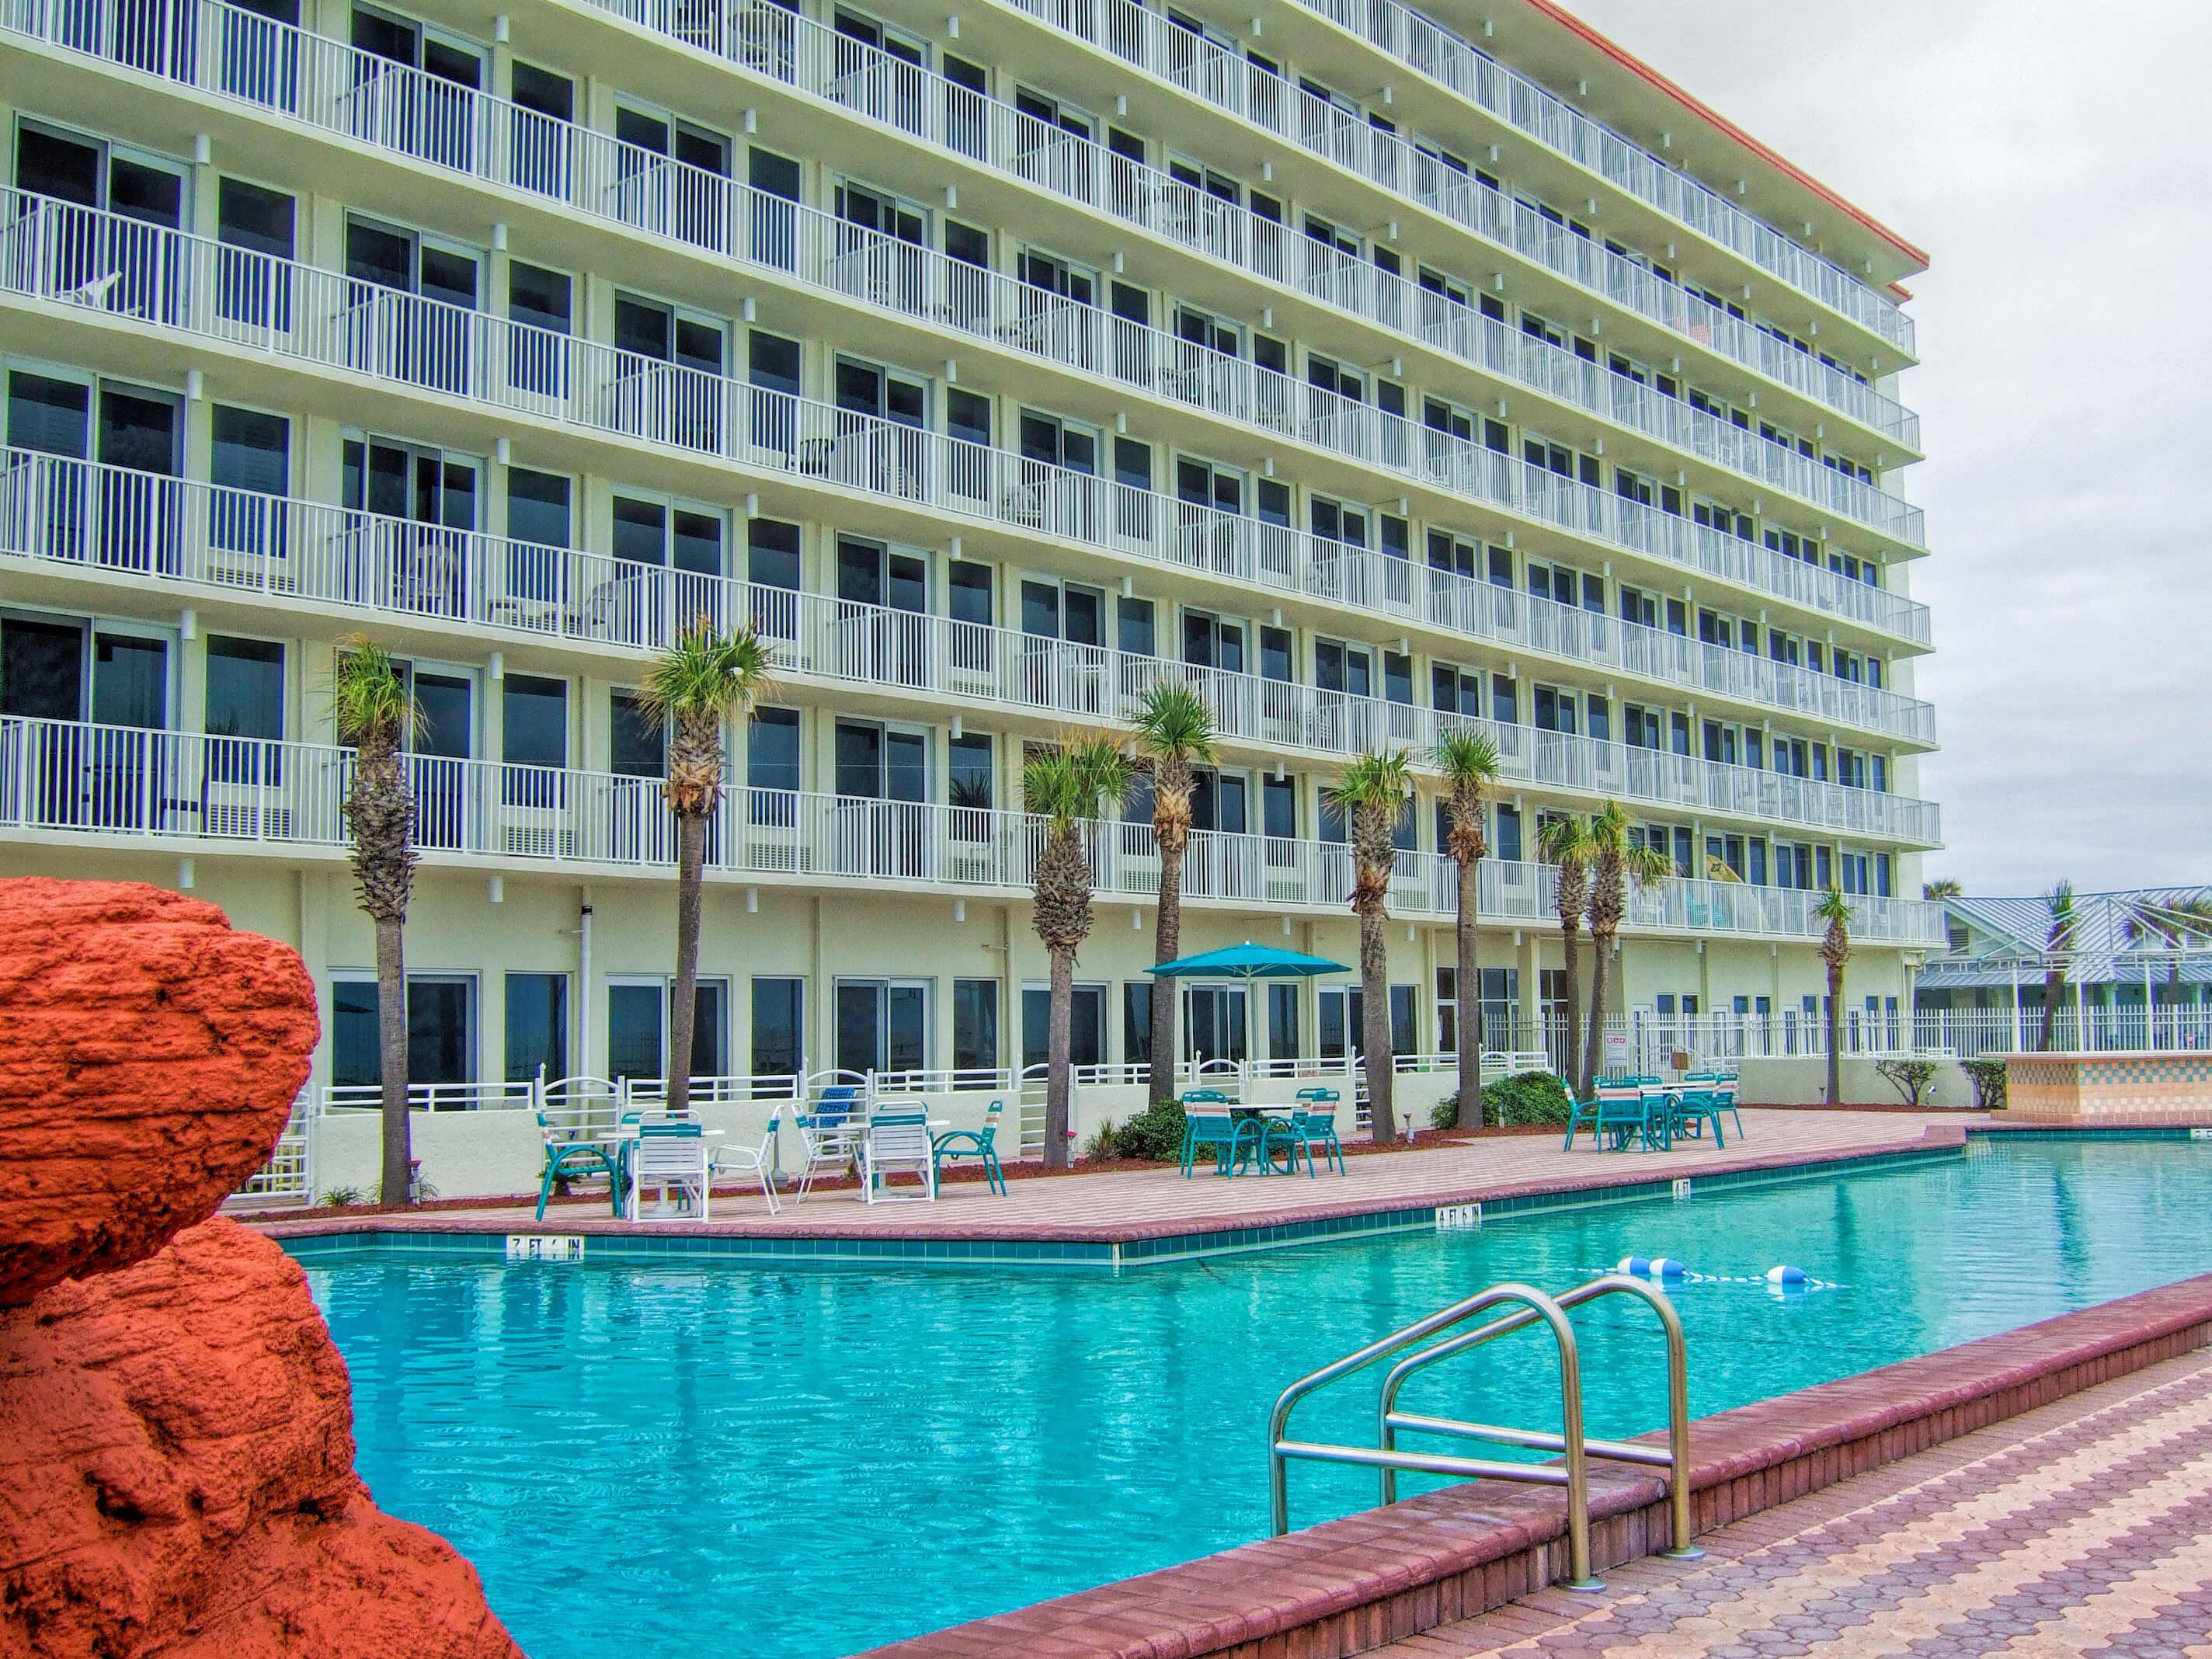 Westgate Resorts | Heated outdoor pool at Daytona Beach resort | Harbour Beach Resort